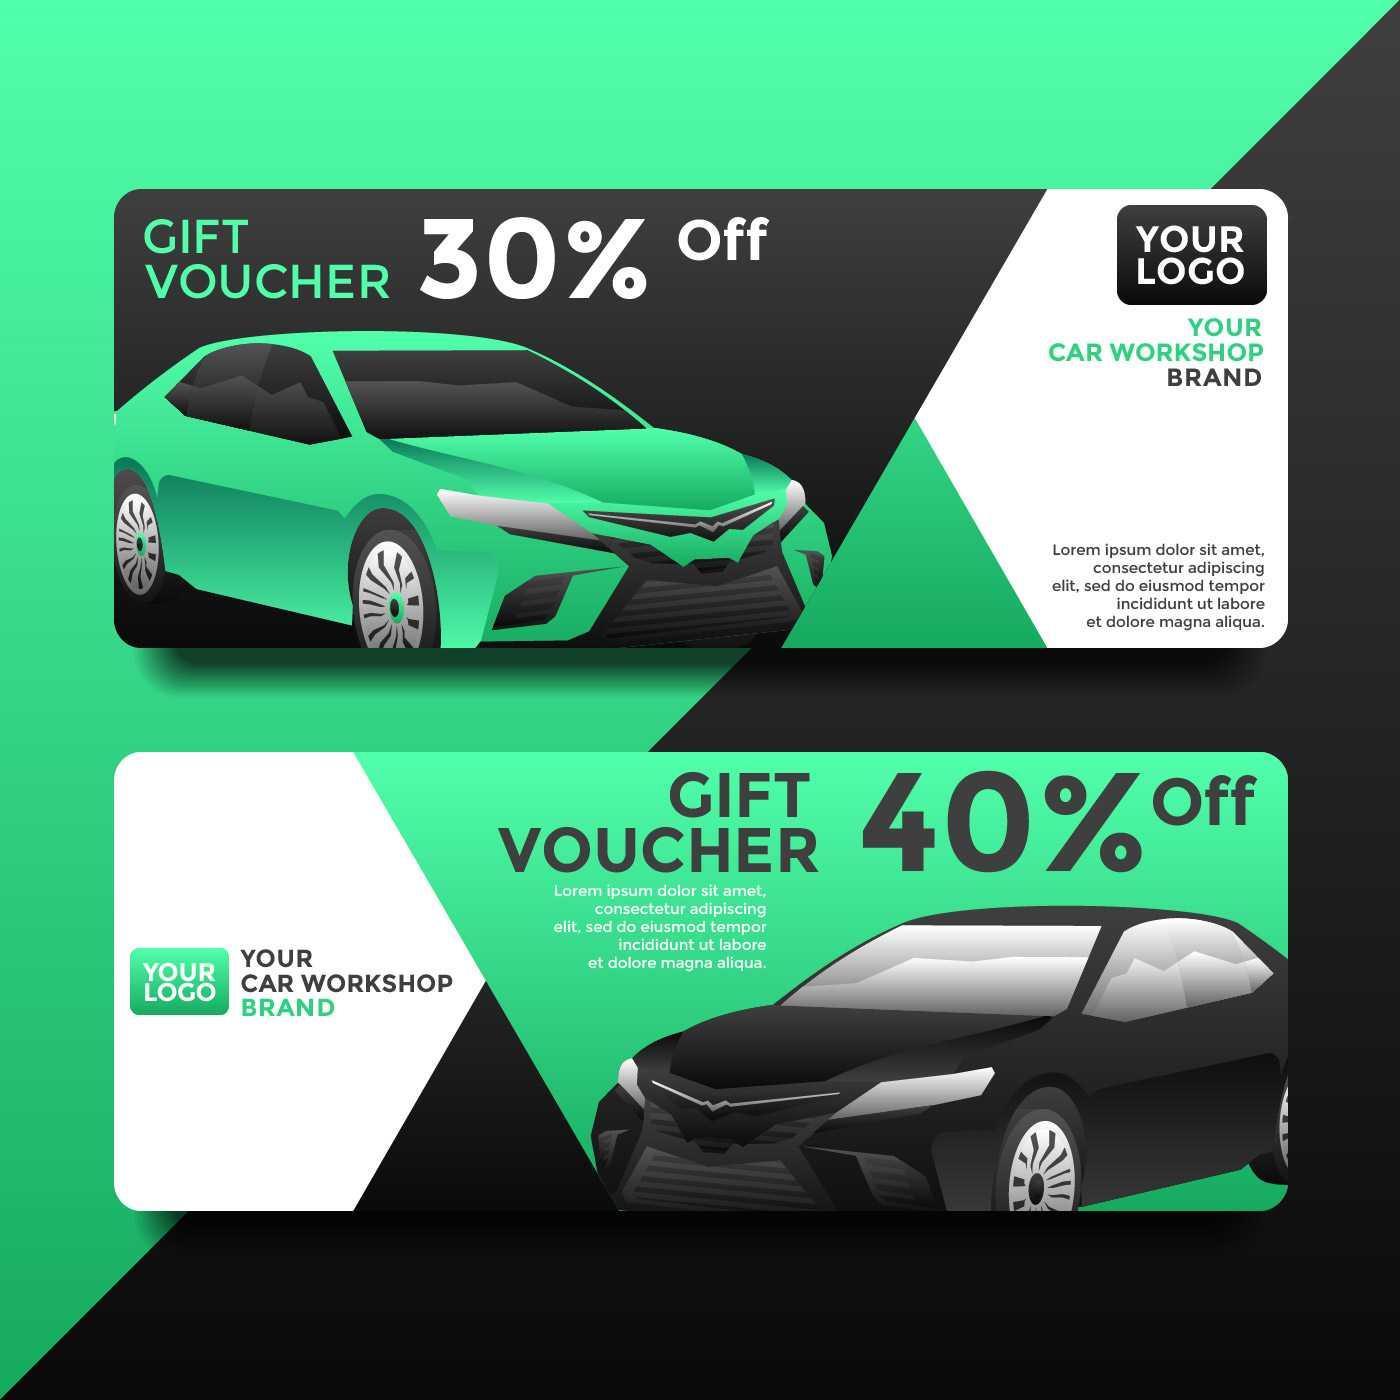 Car Business Card Free Vector Art - (270 Free Downloads) Regarding Automotive Gift Certificate Template